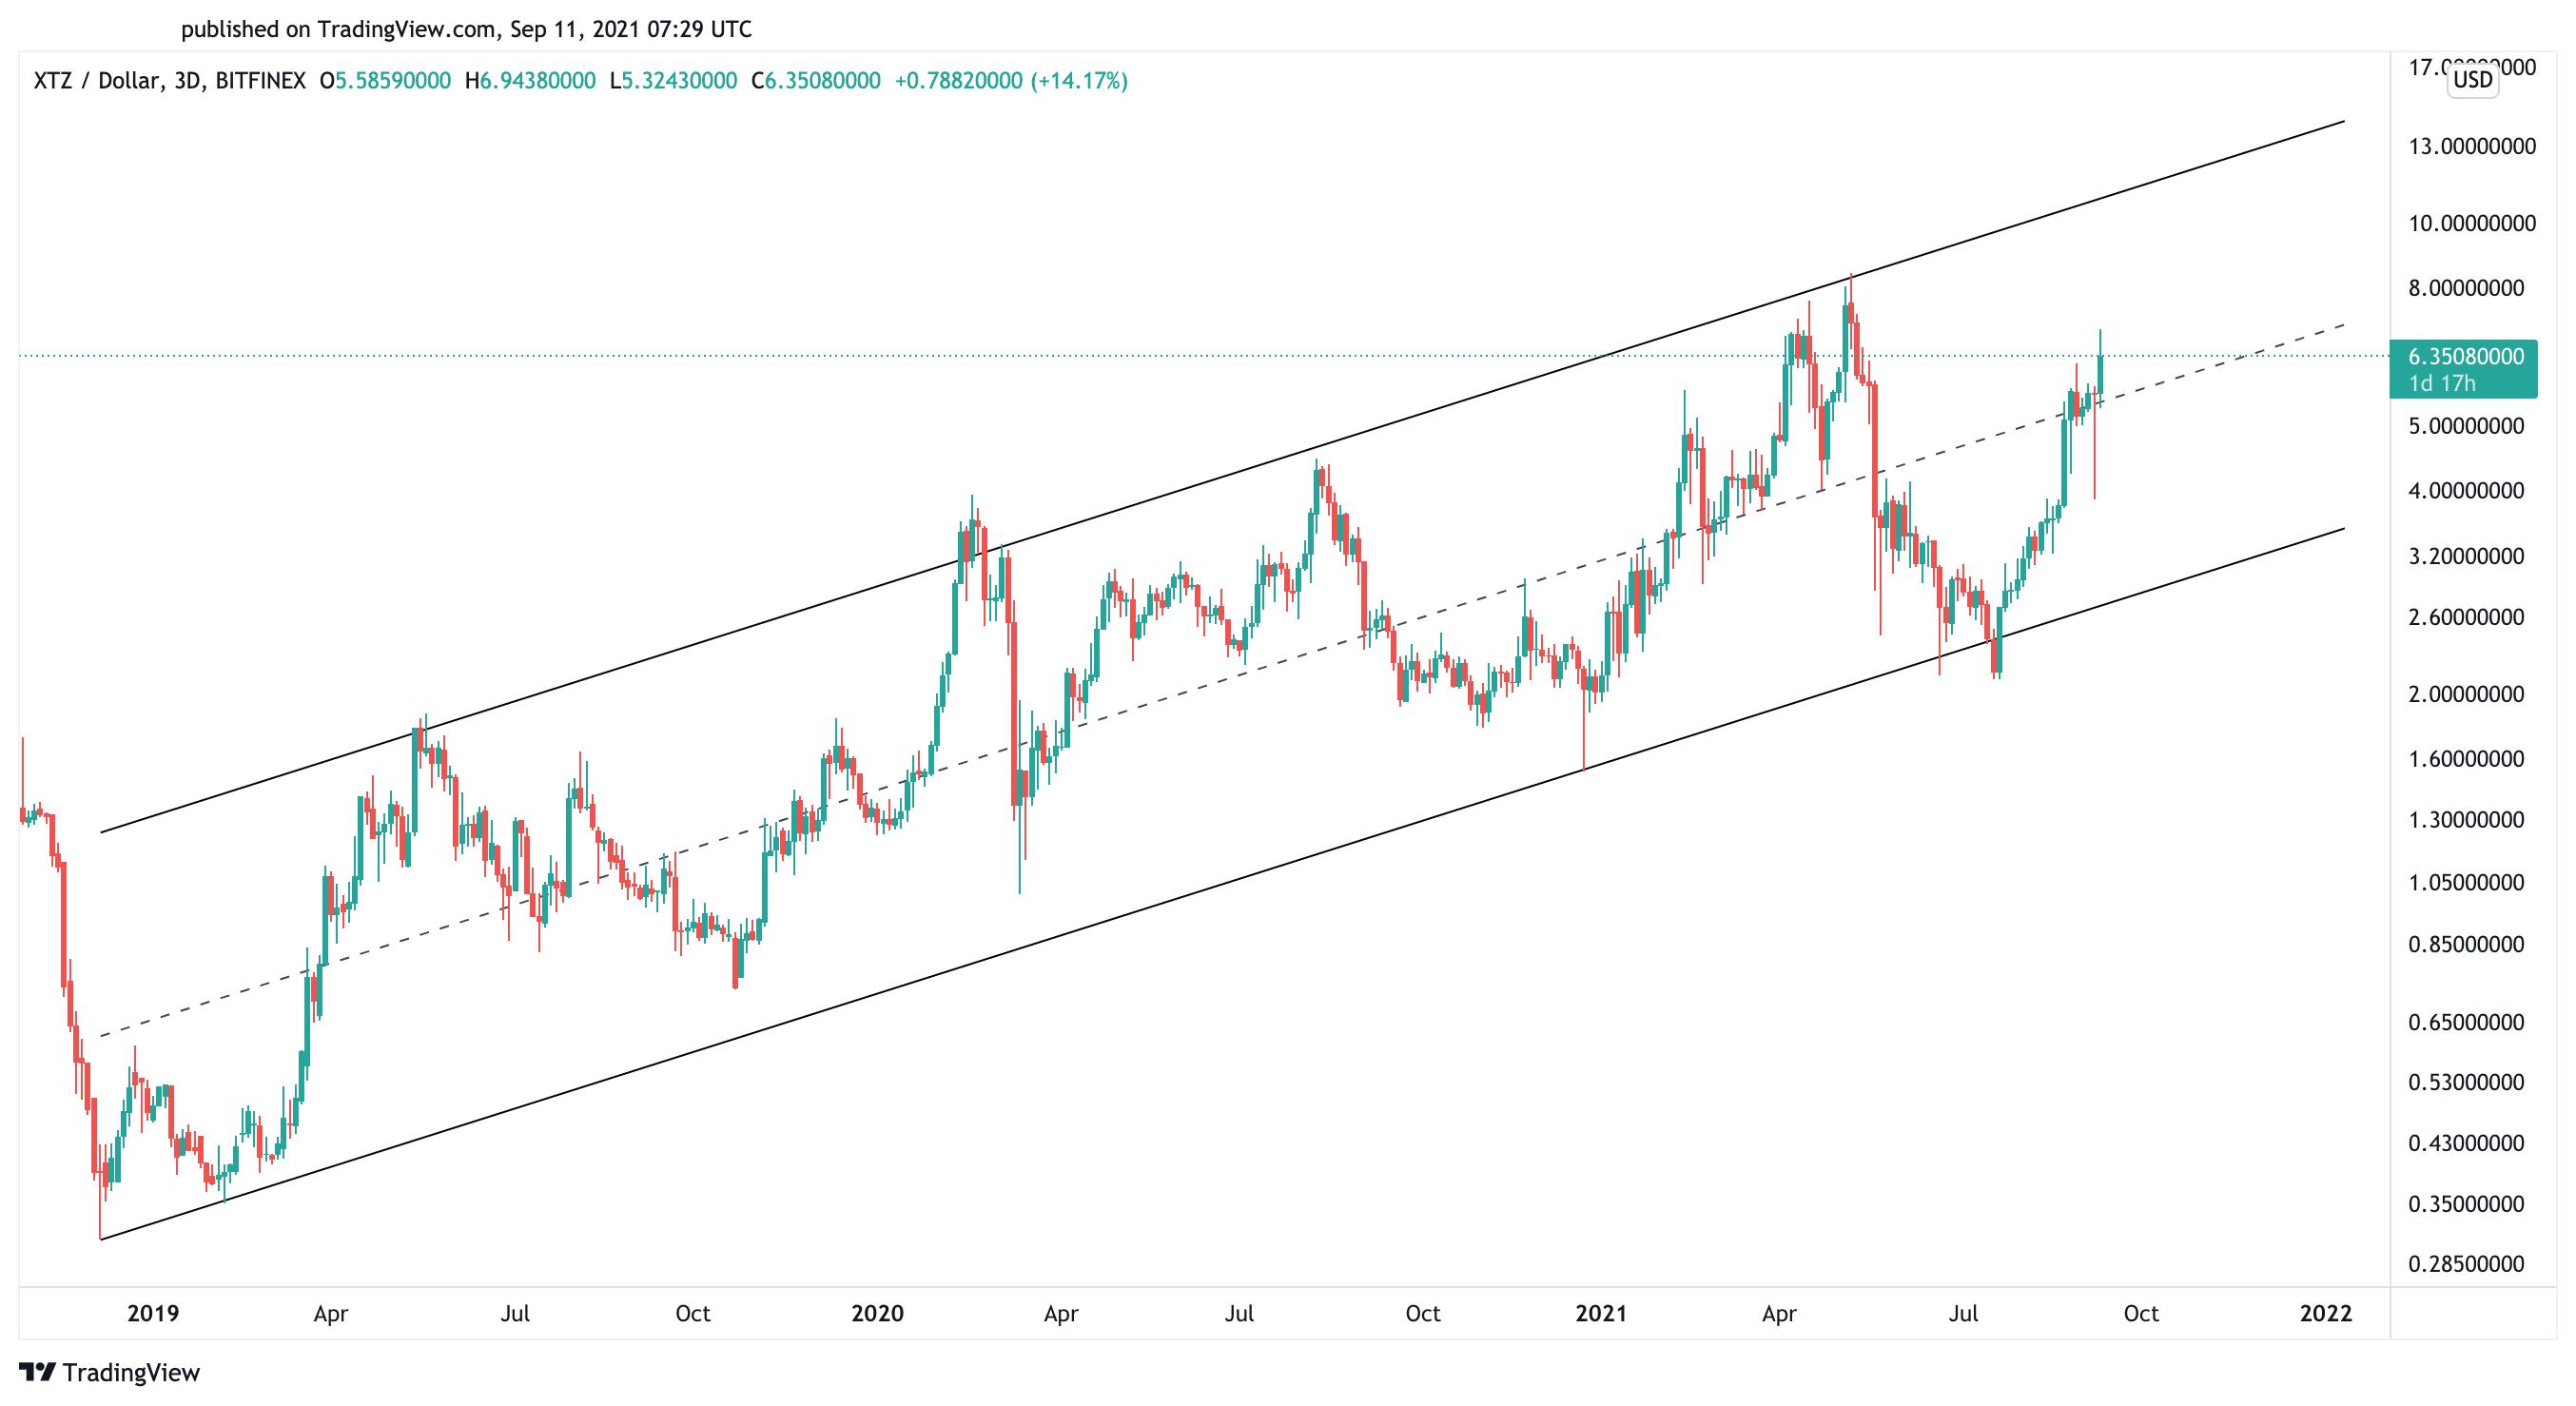 Tezos US dollar price chart